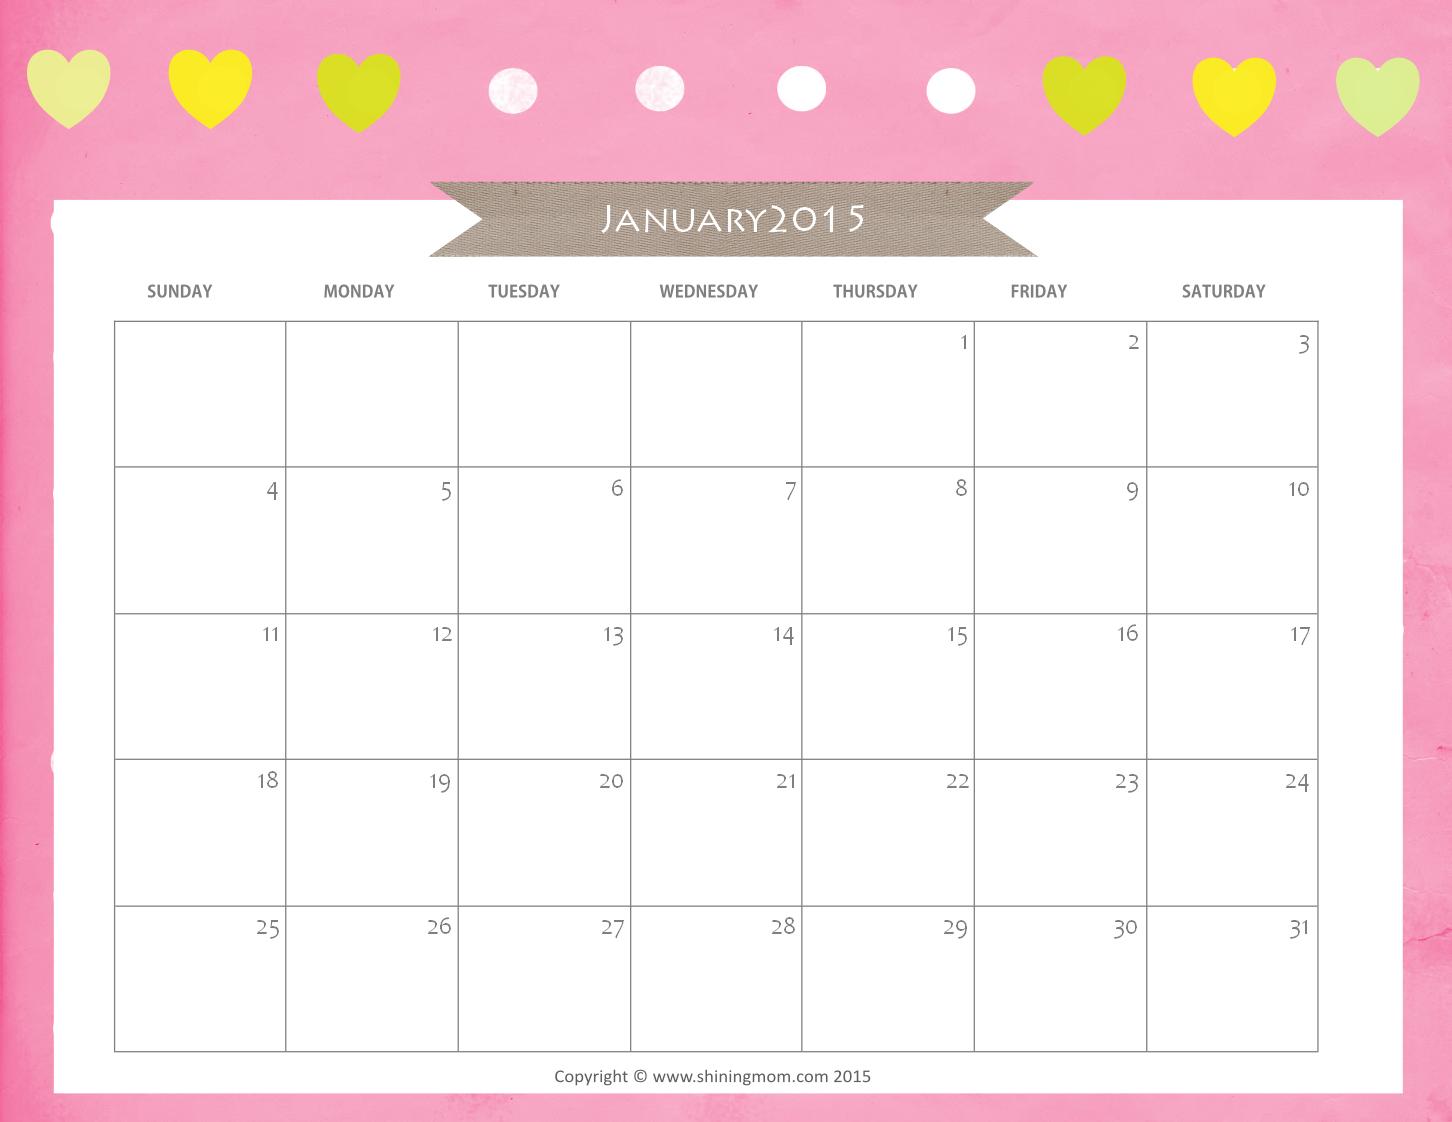 JANUARY 2015 CALENDAR free printable1